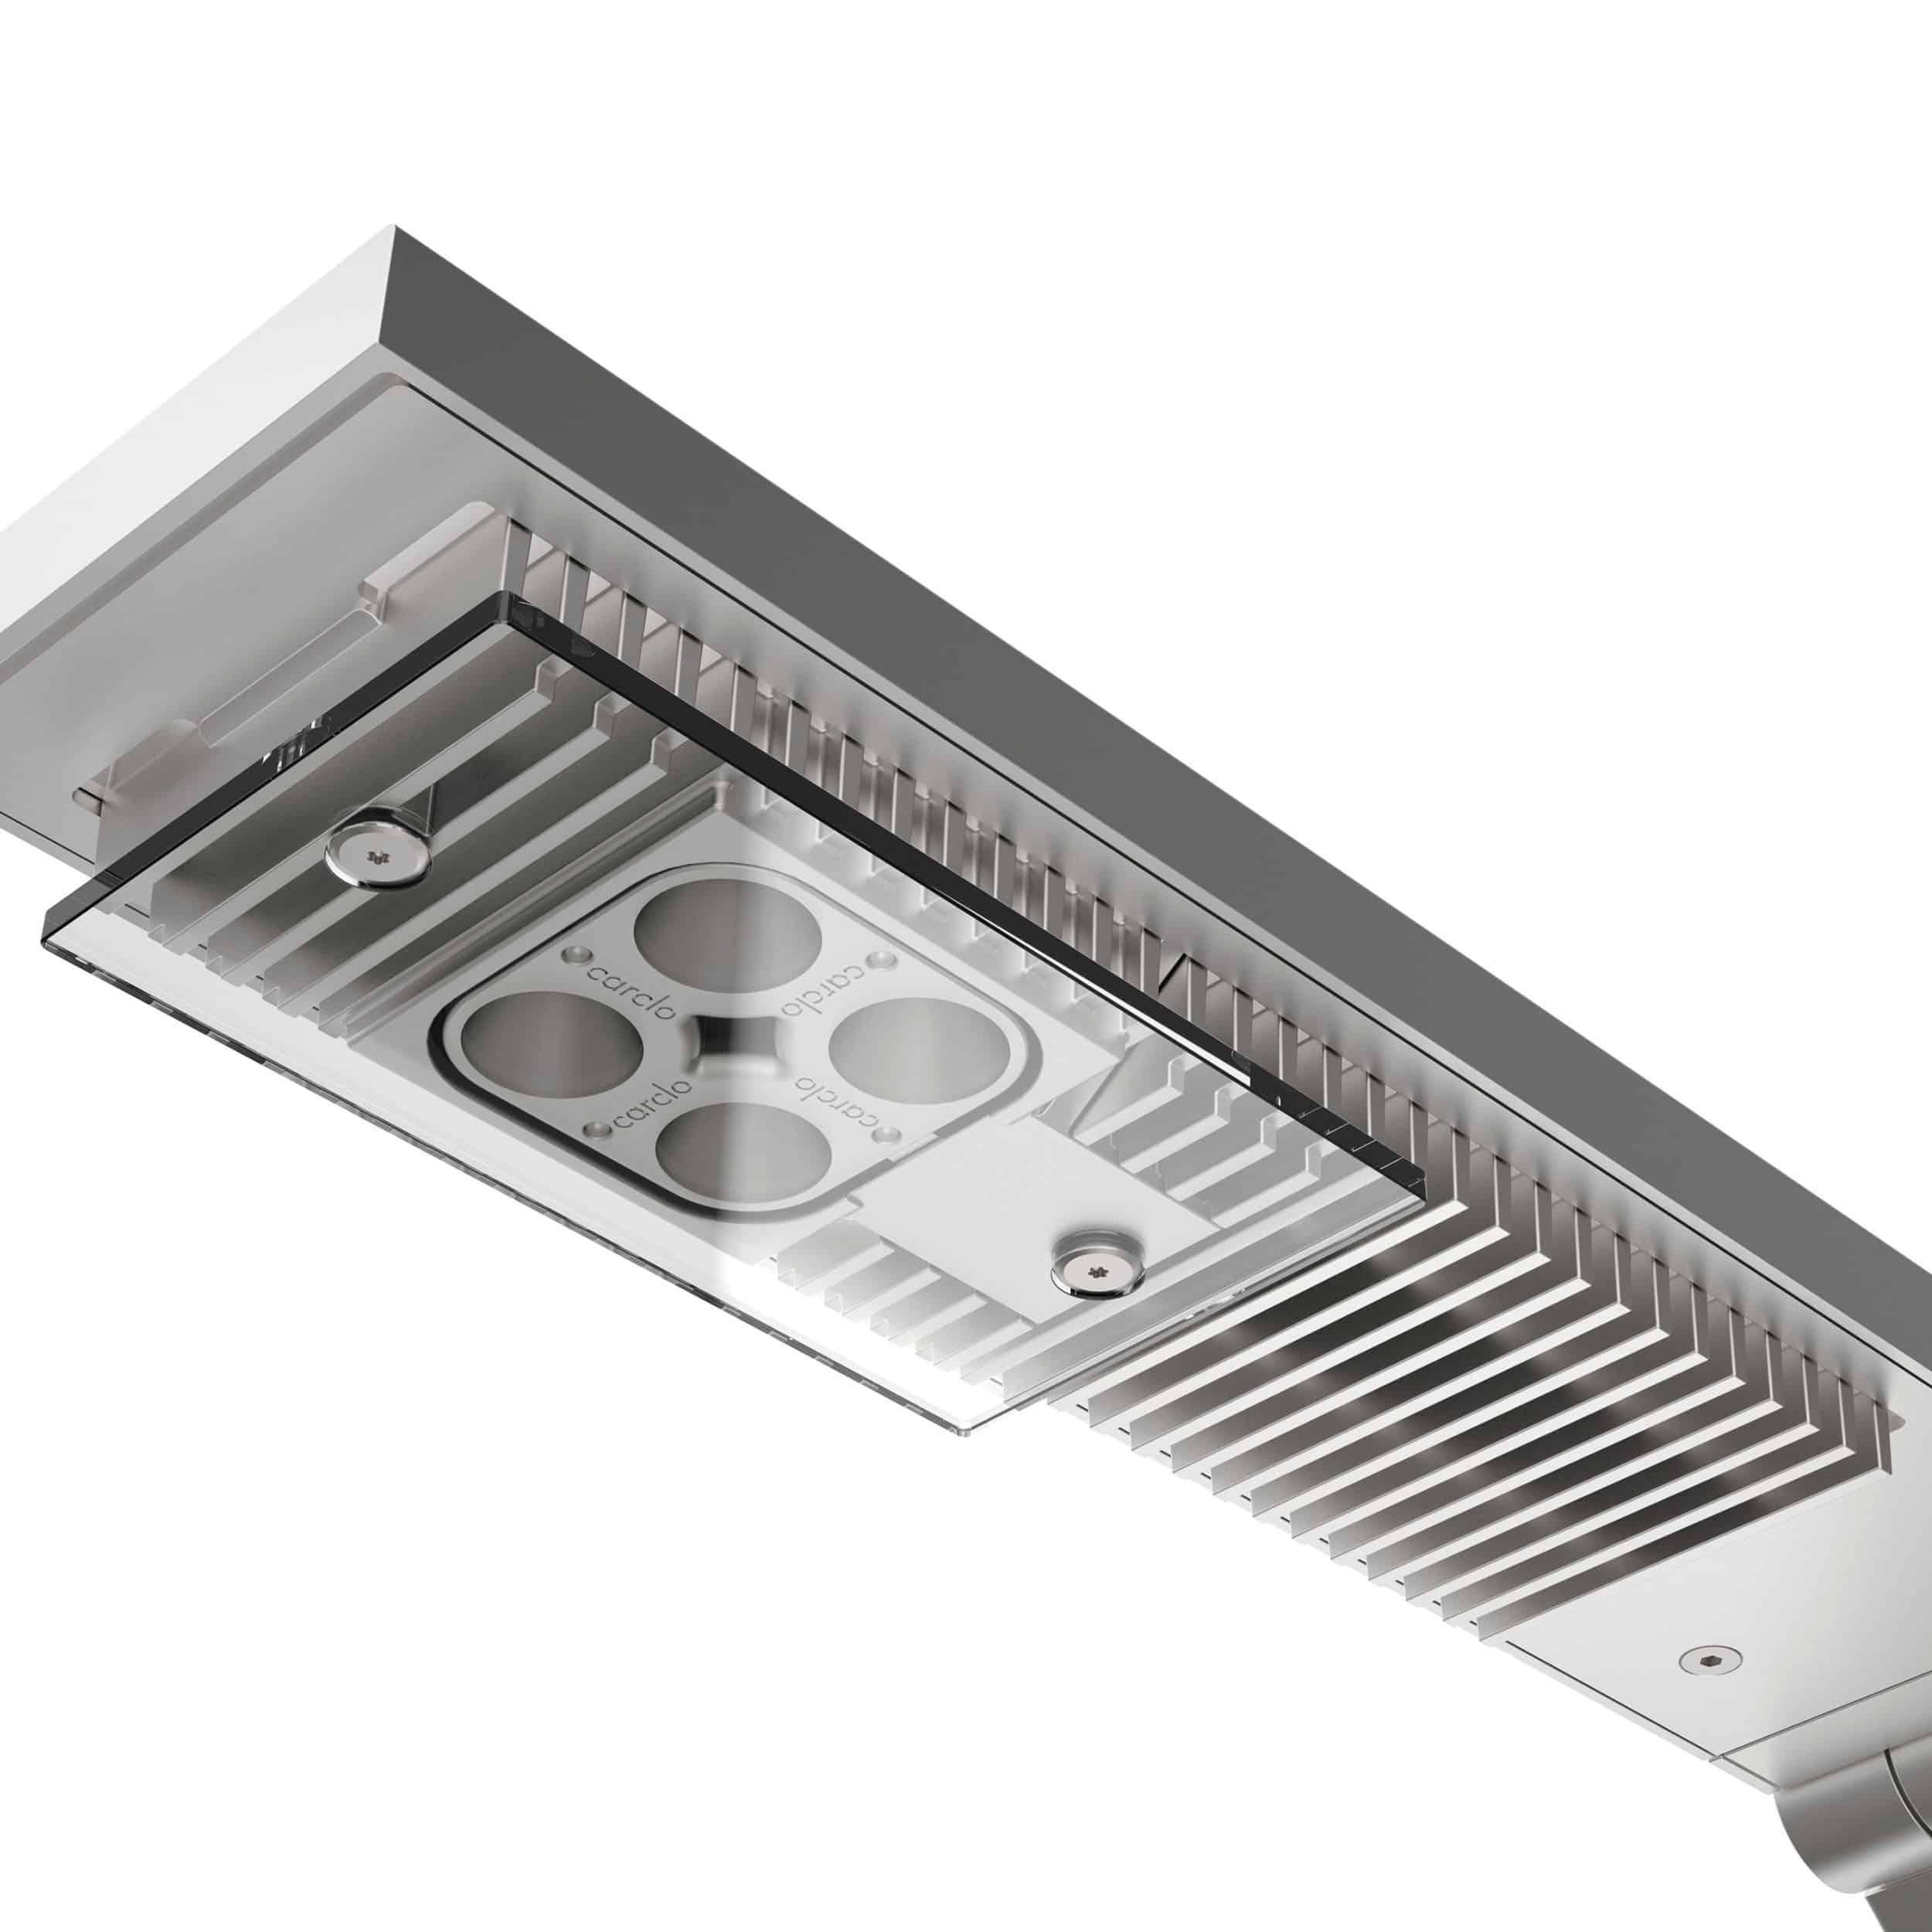 Linear Table Pro LED Tischleuchte